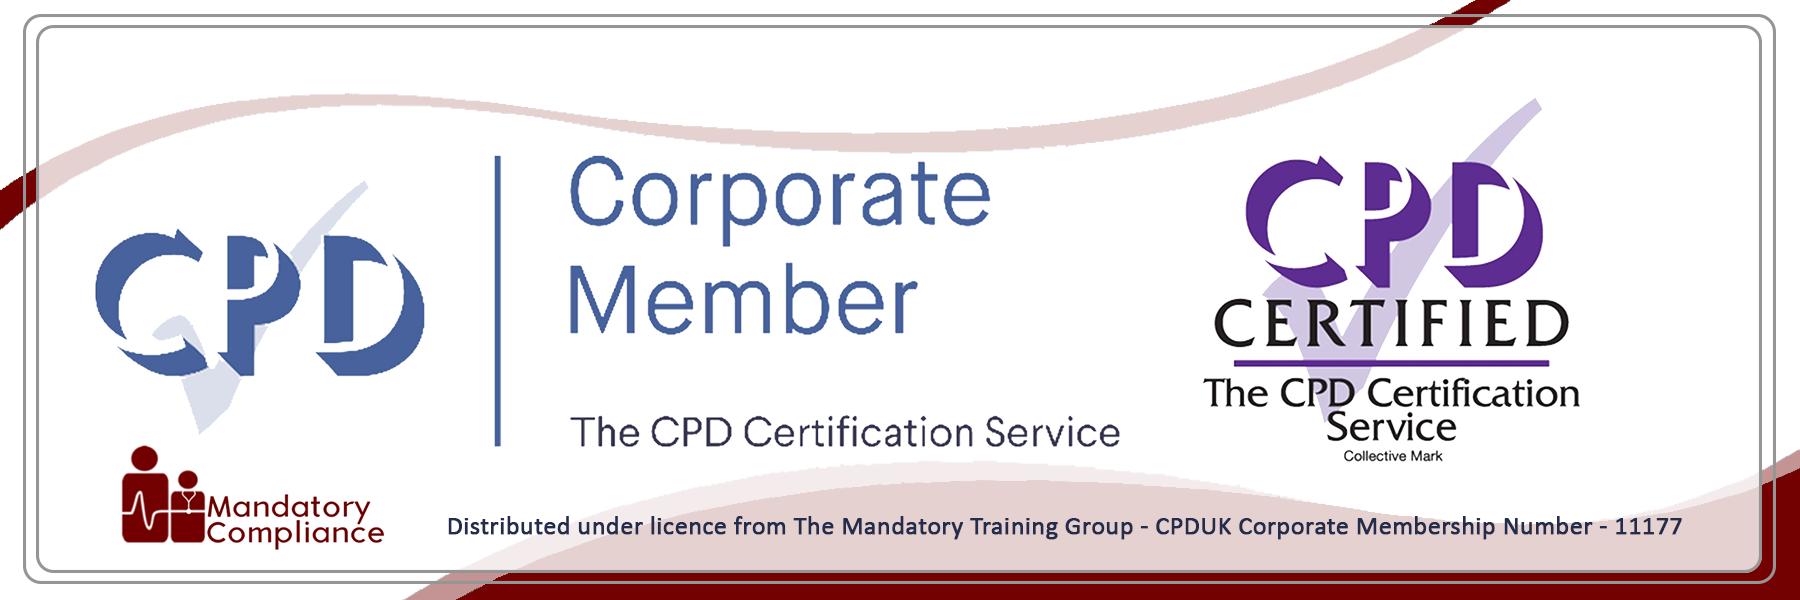 Business Acumen - Online Training Course - CPDUK Accredited - Mandatory Compliance UK -